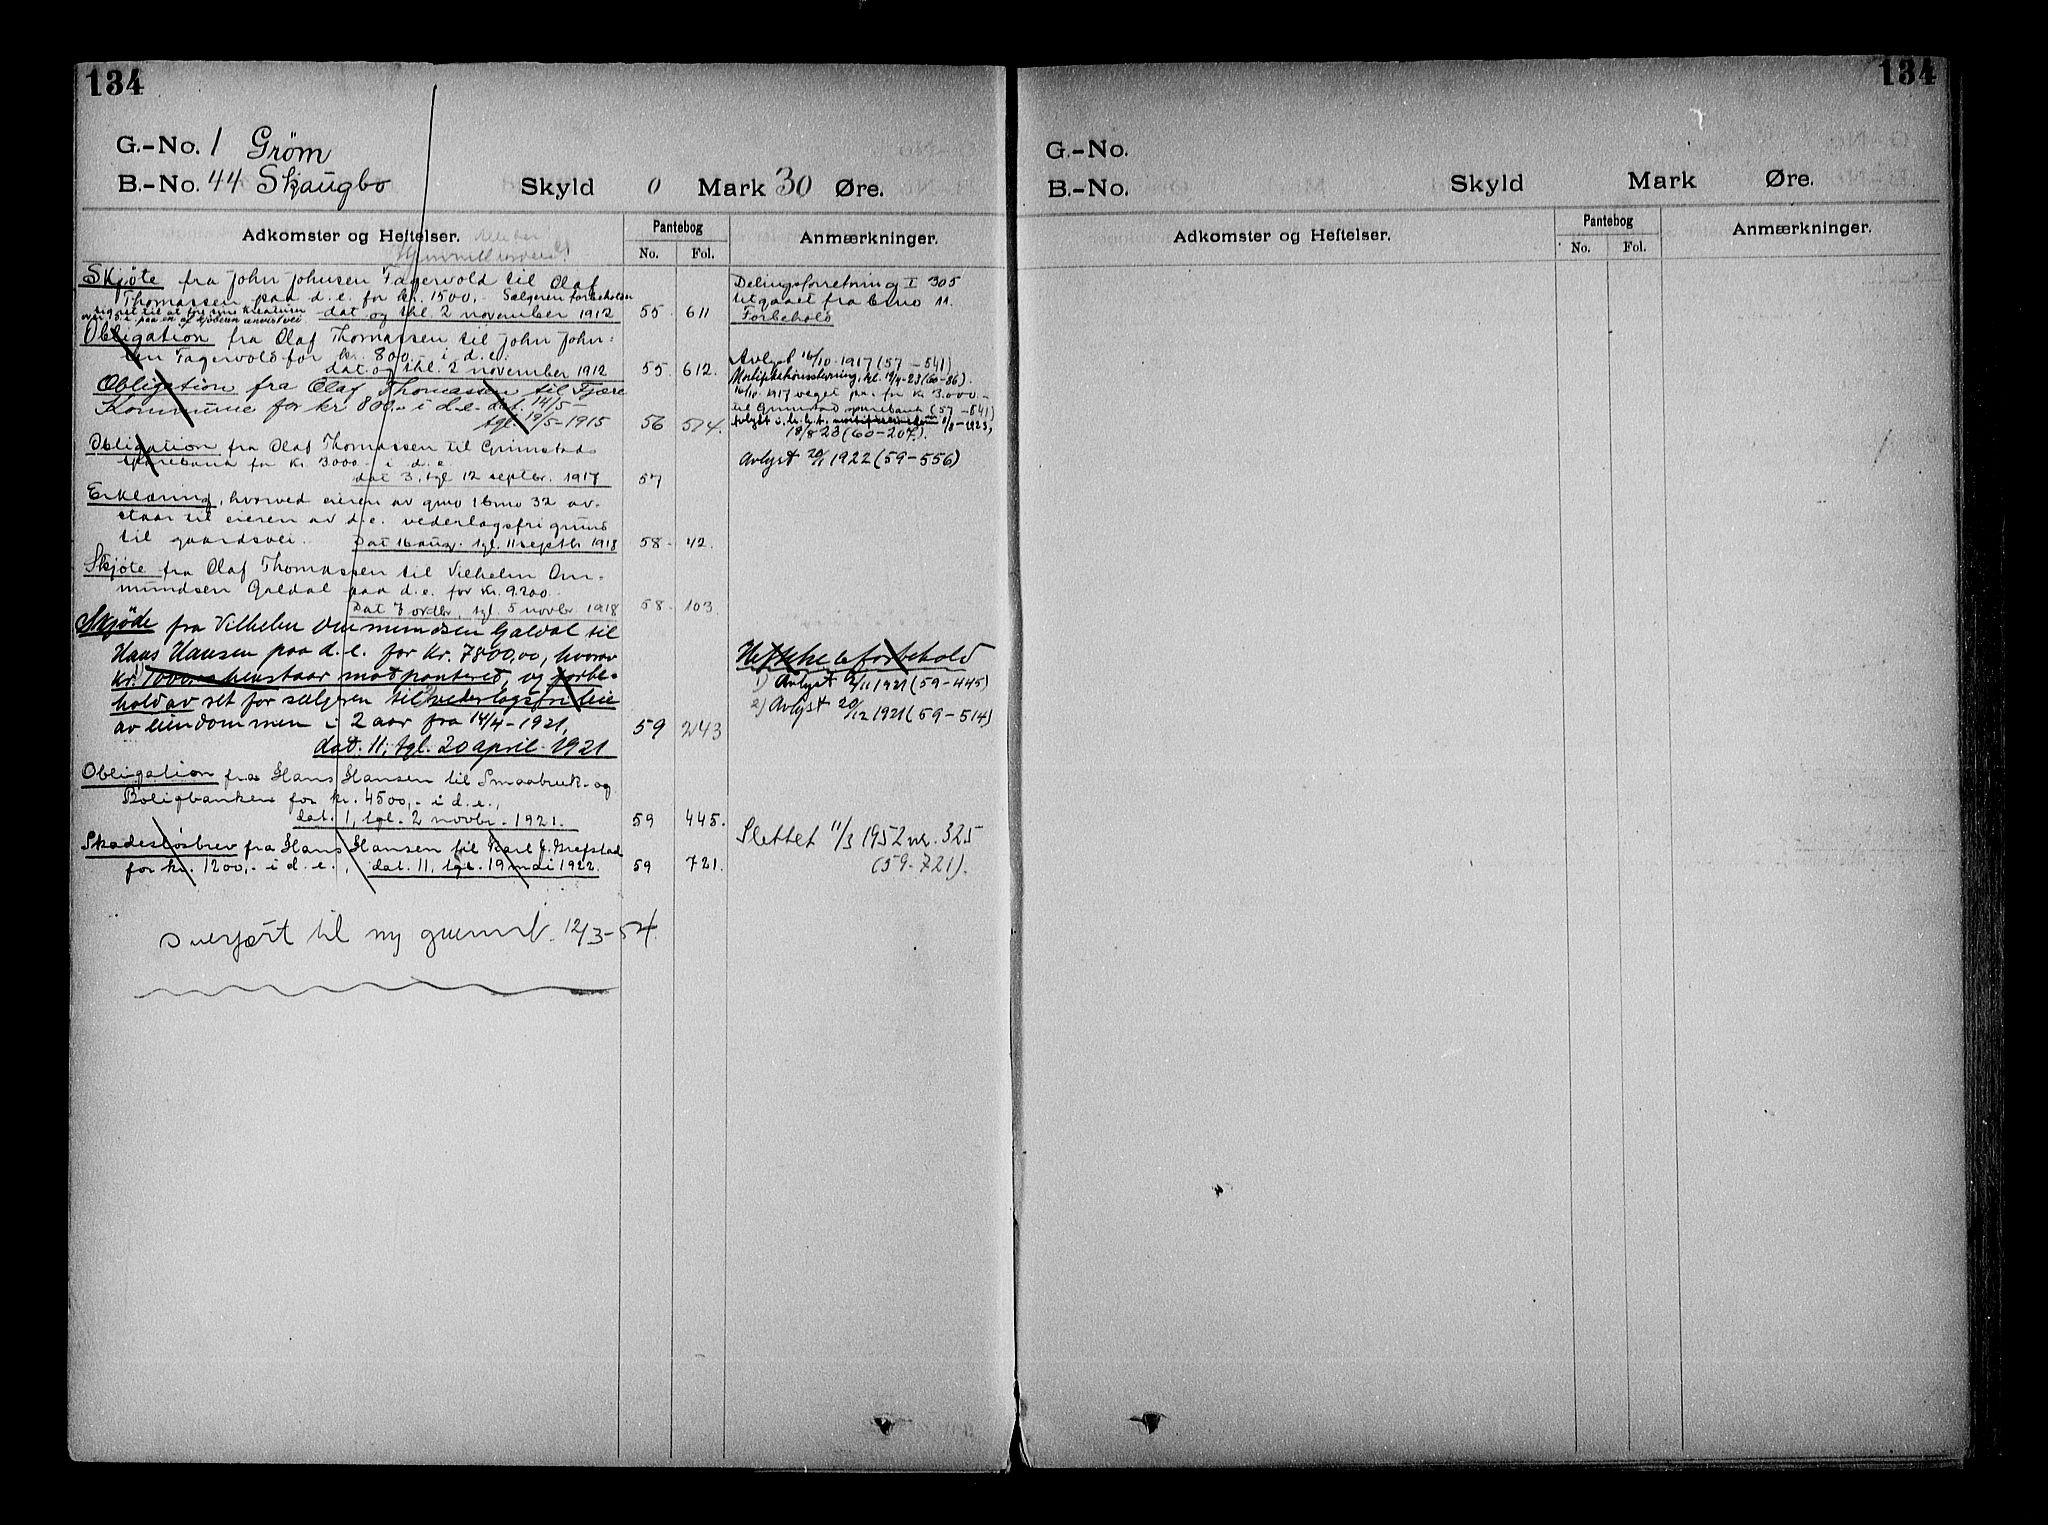 SAK, Vestre Nedenes/Sand sorenskriveri, G/Ga/L0022: Panteregister nr. 15, 1899-1957, s. 134